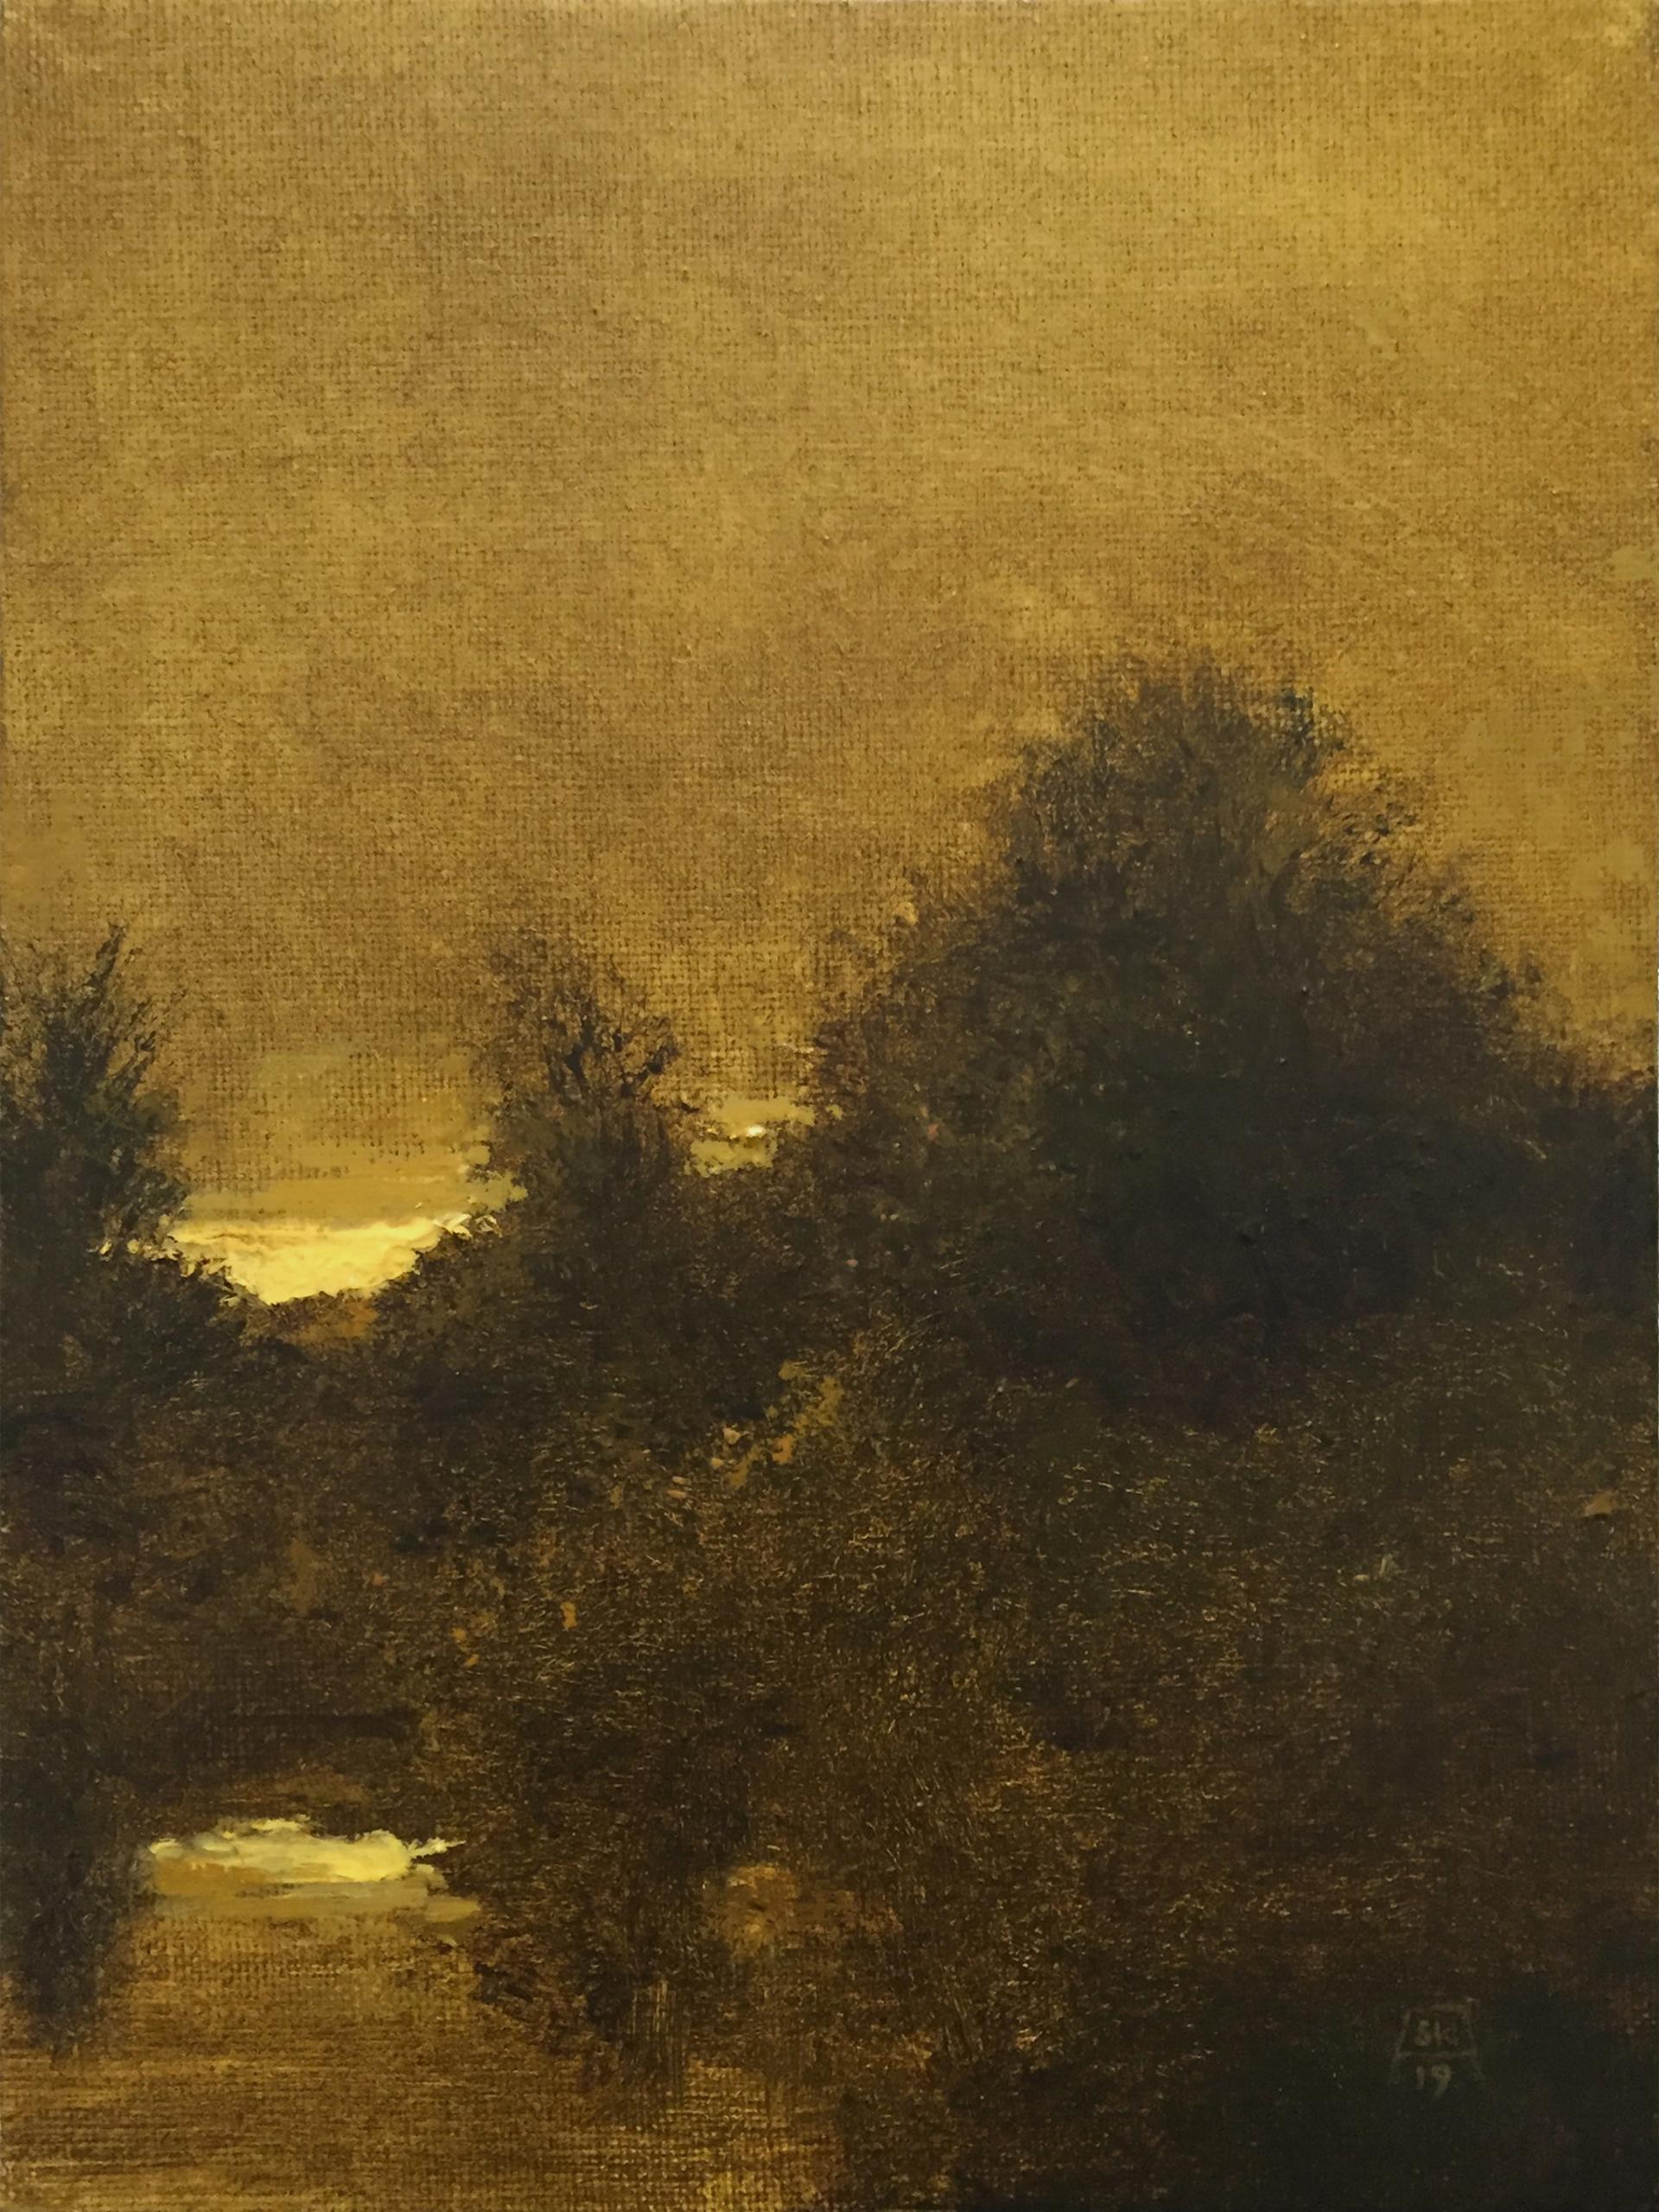 Evening Silhouette by Shawn Krueger